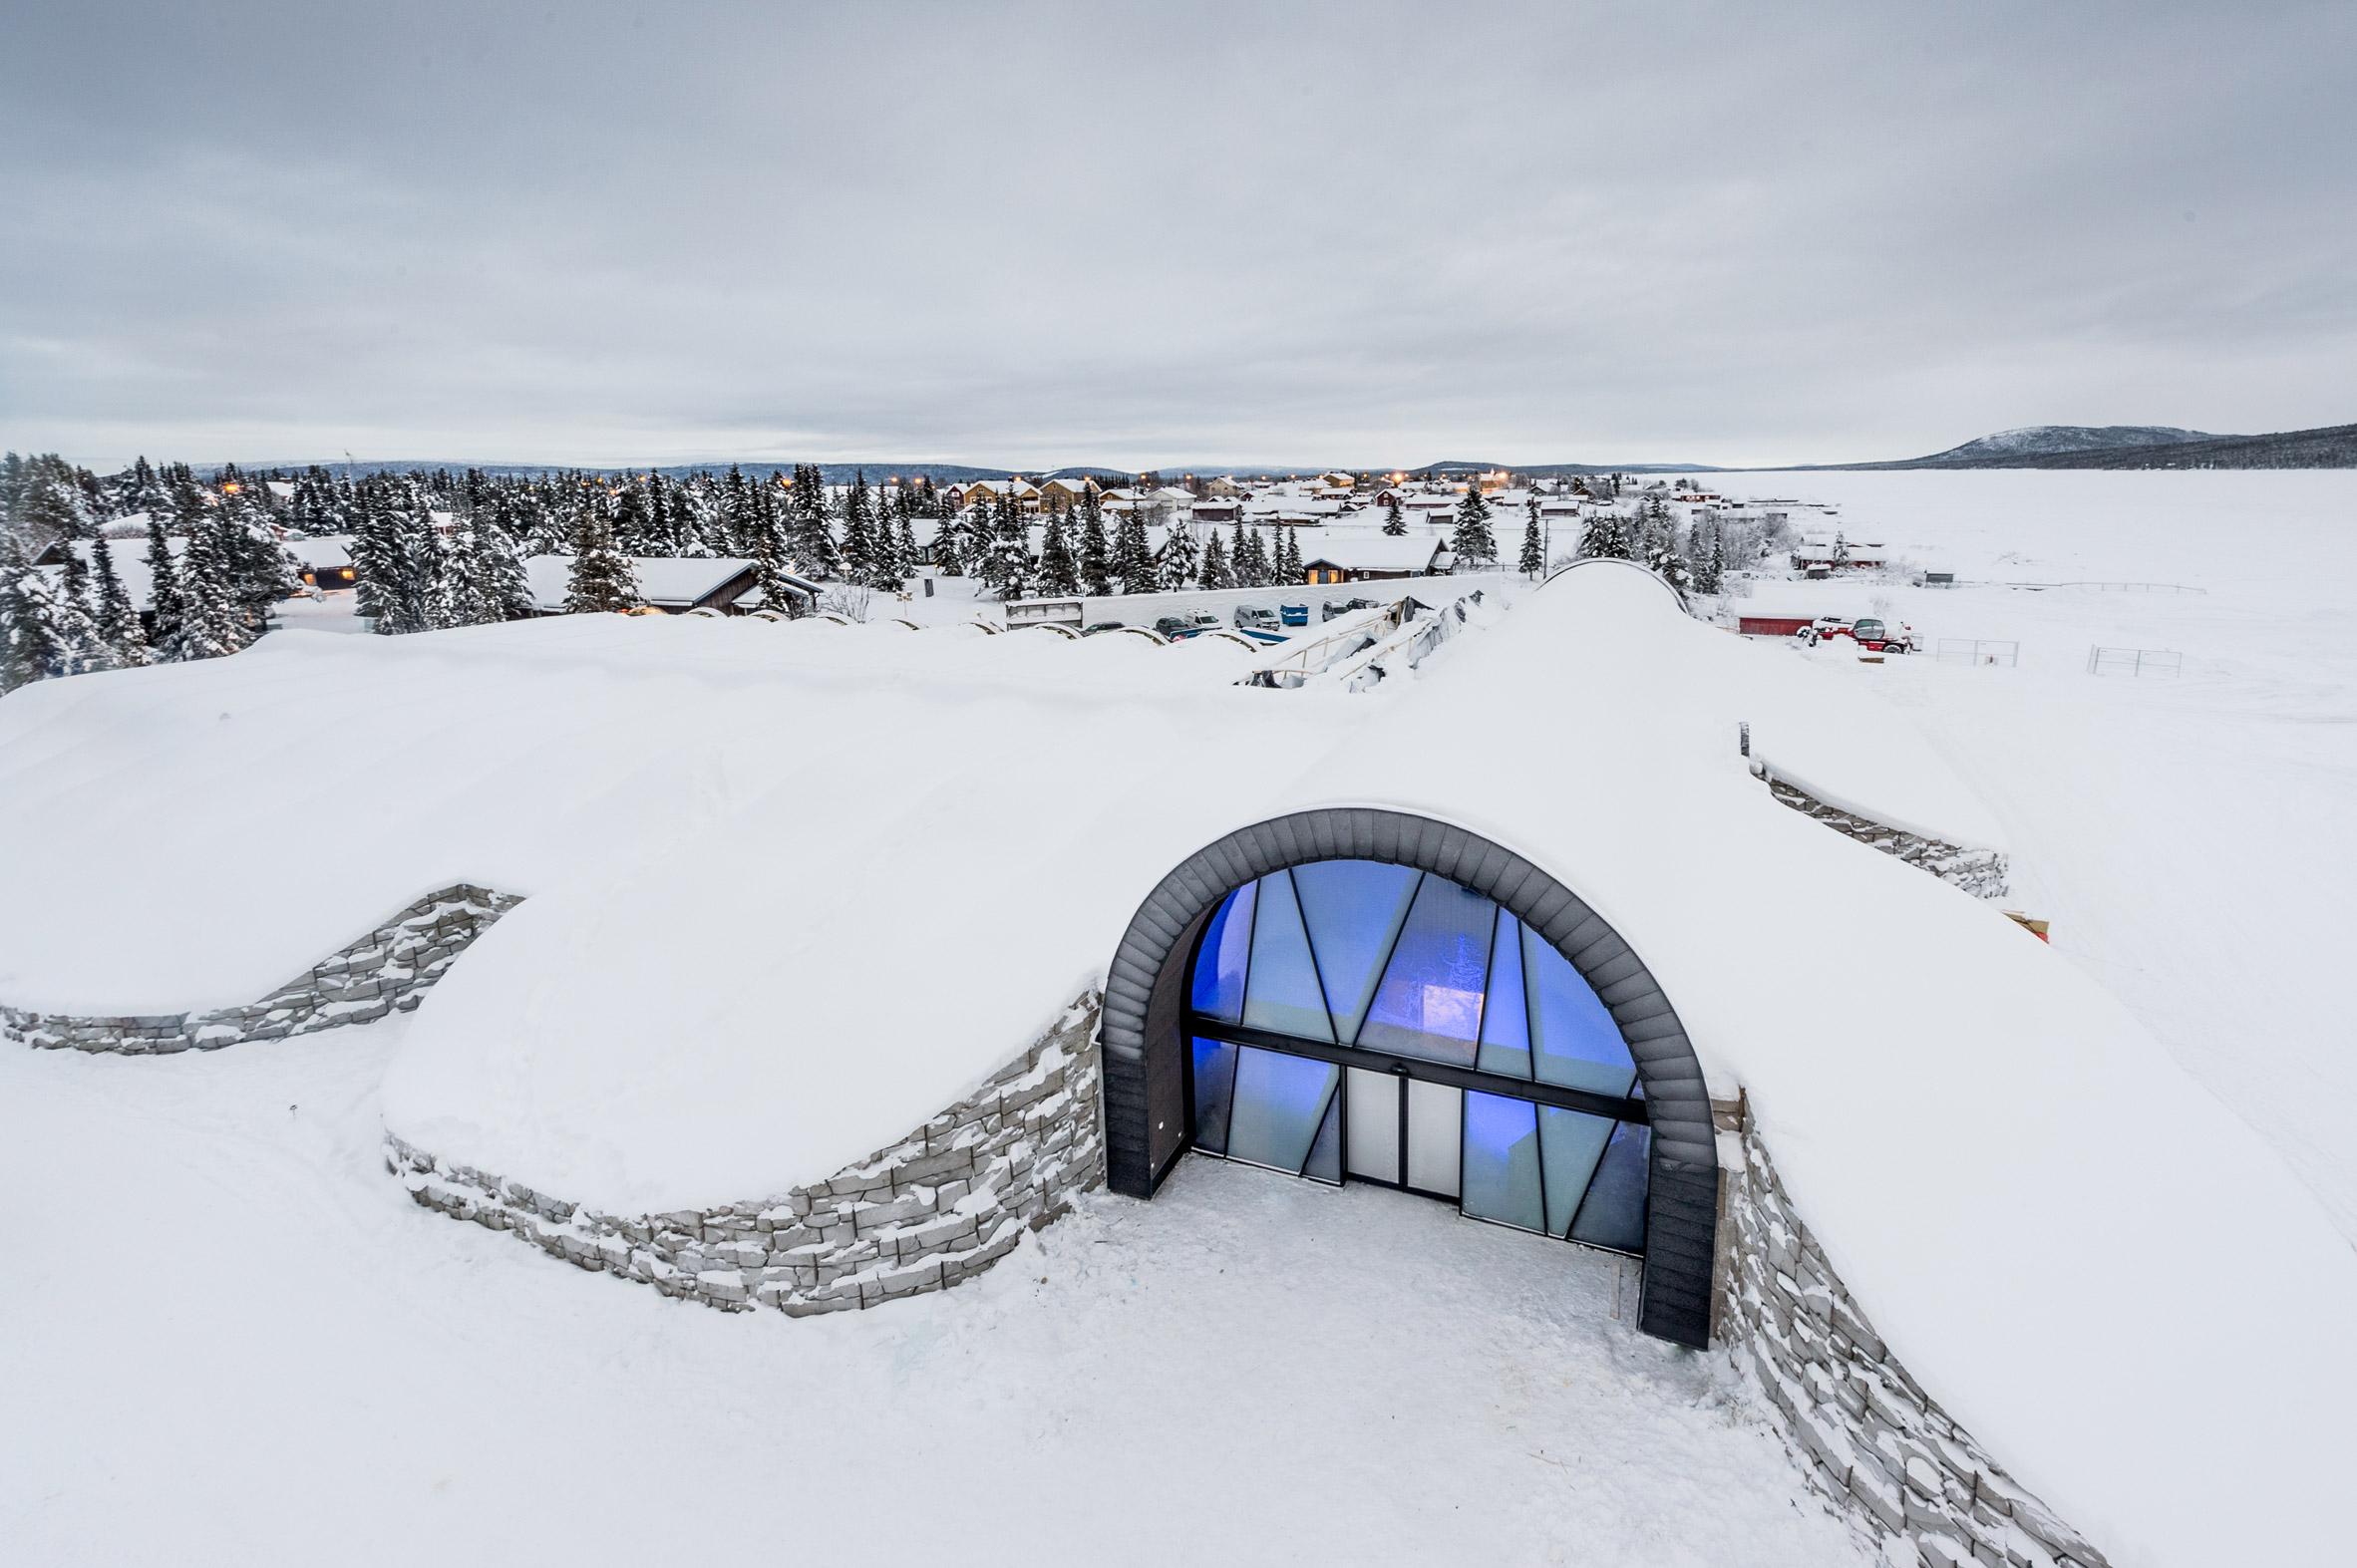 ice-hotel-365-discover-the-world-jukkasjarvi-interior_dezeen_2364_col_11